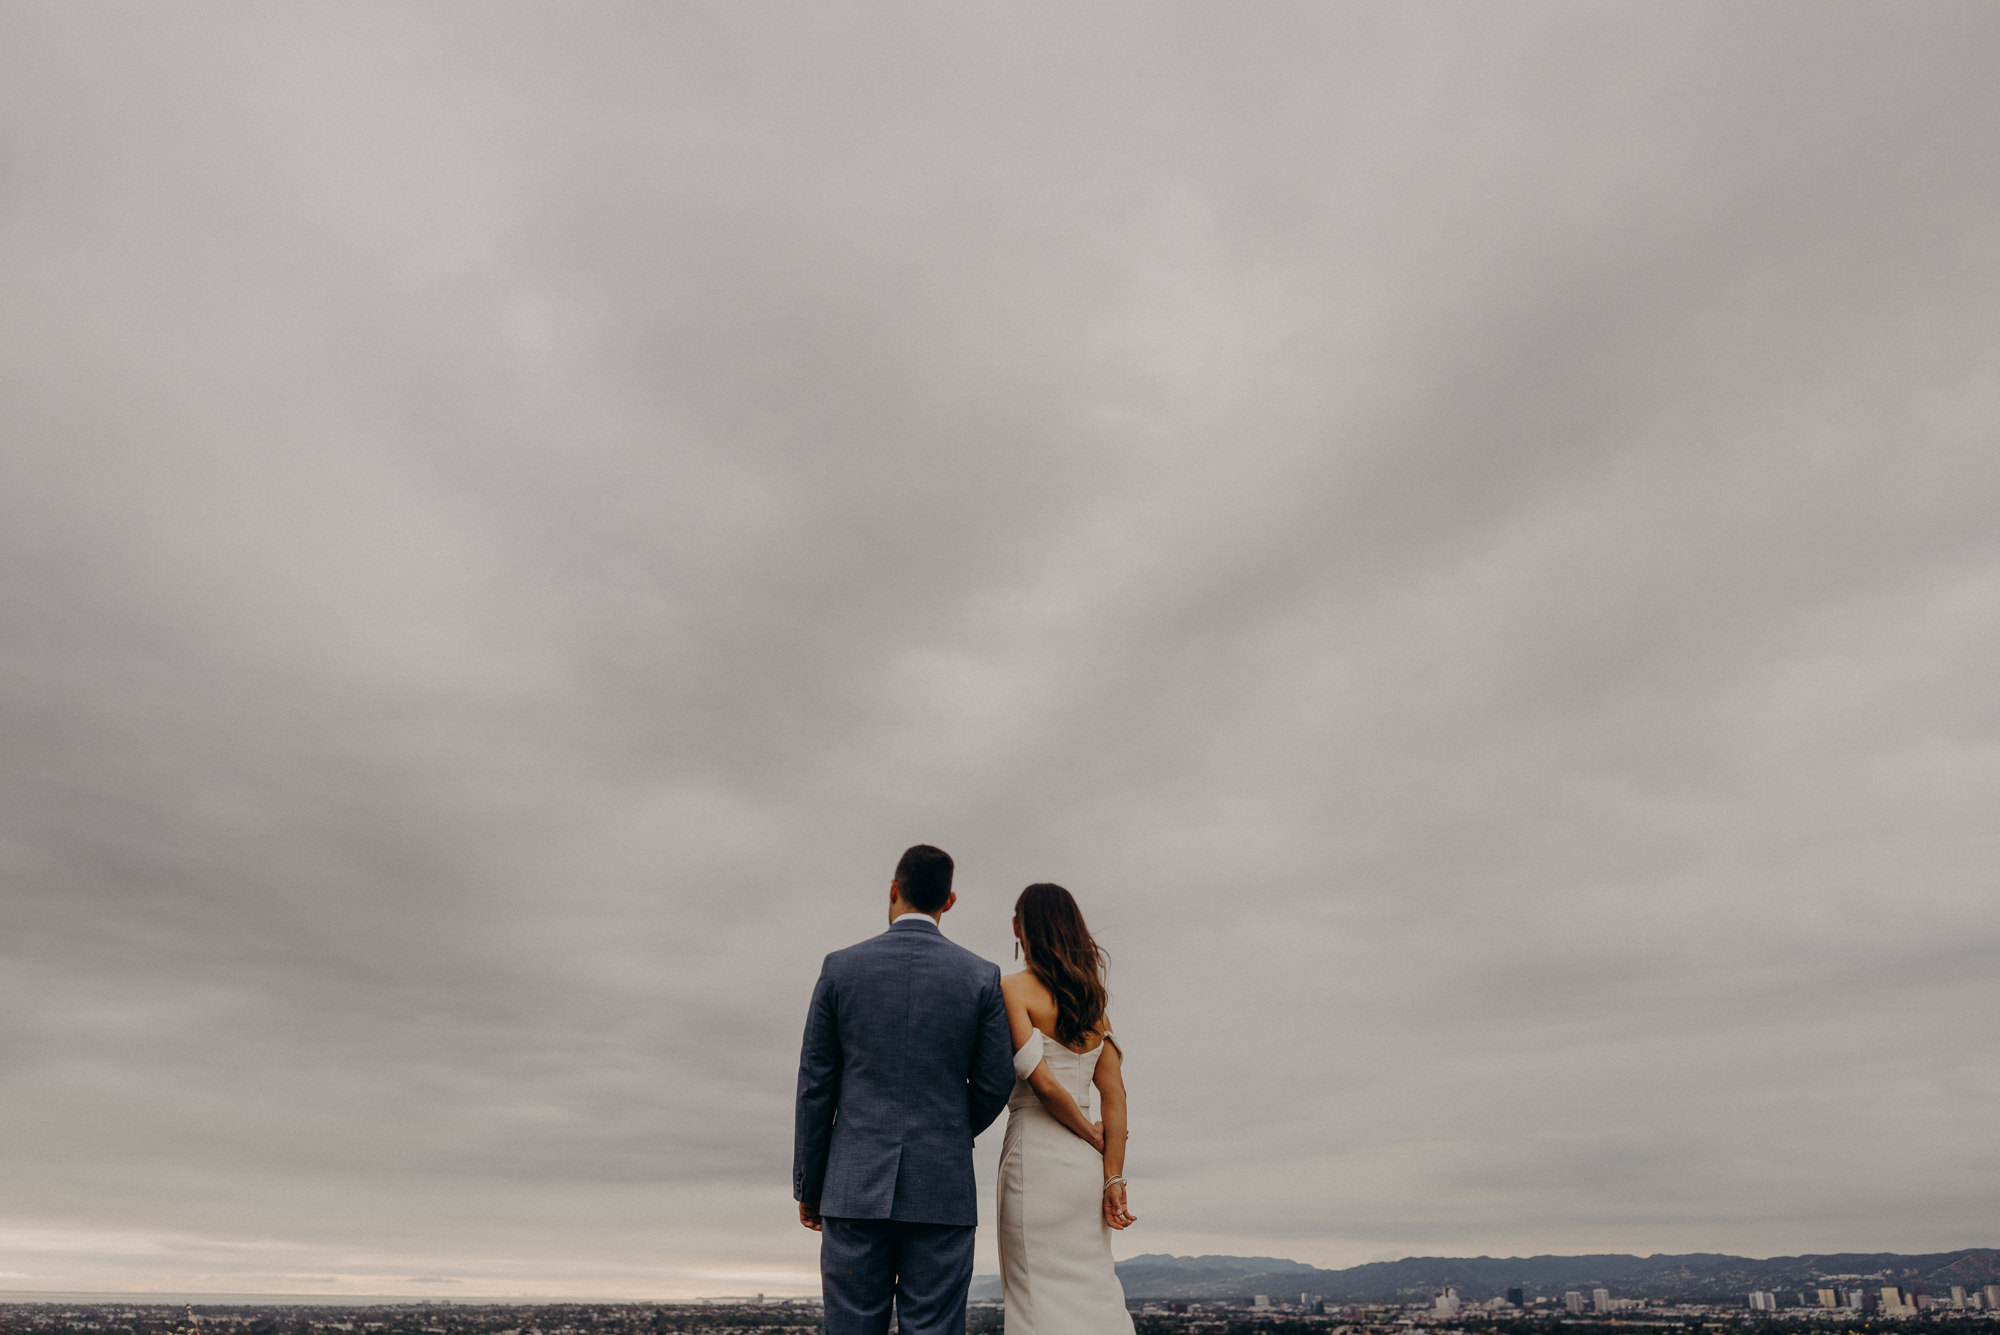 elopement photographer in los angeles - la wedding photographer - isaiahandtaylor.com-039.jpg